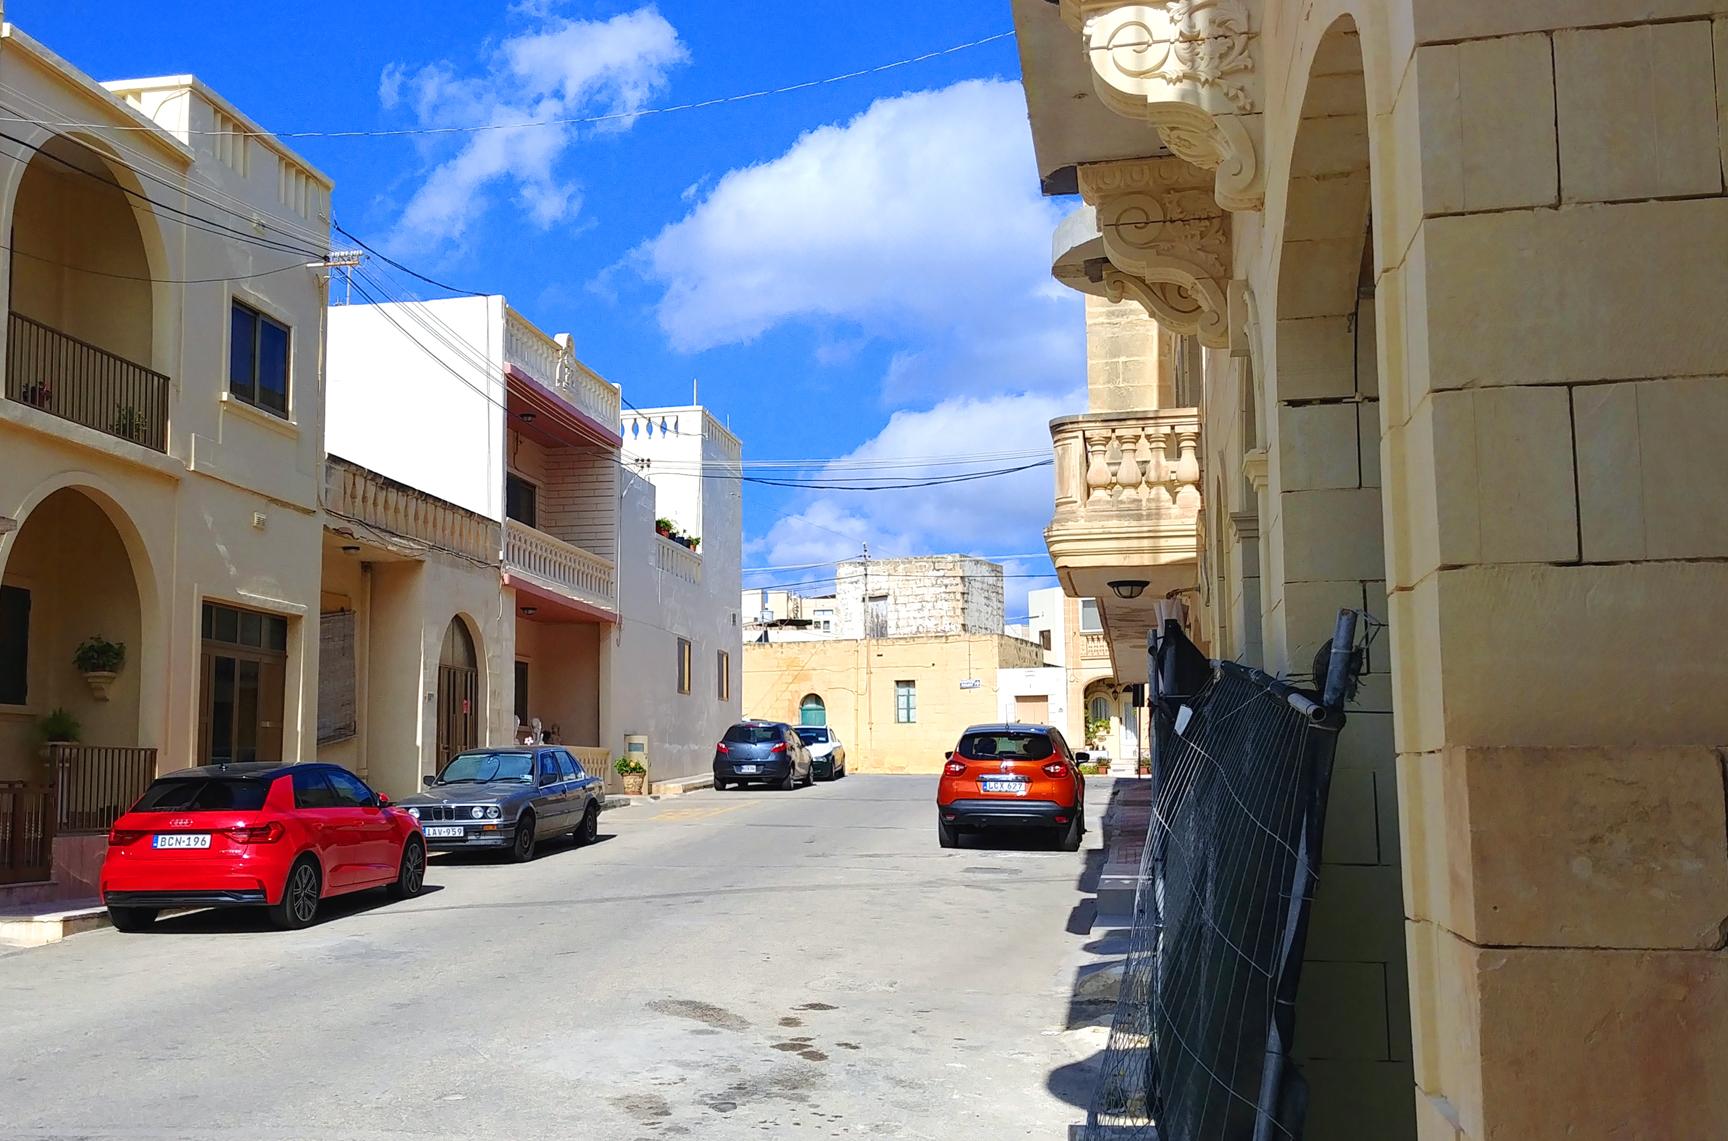 Triq il-Gleneagles Street, Ghajnsielem Gozo. My home for 2-weeks. Photo: Mary Charlebois